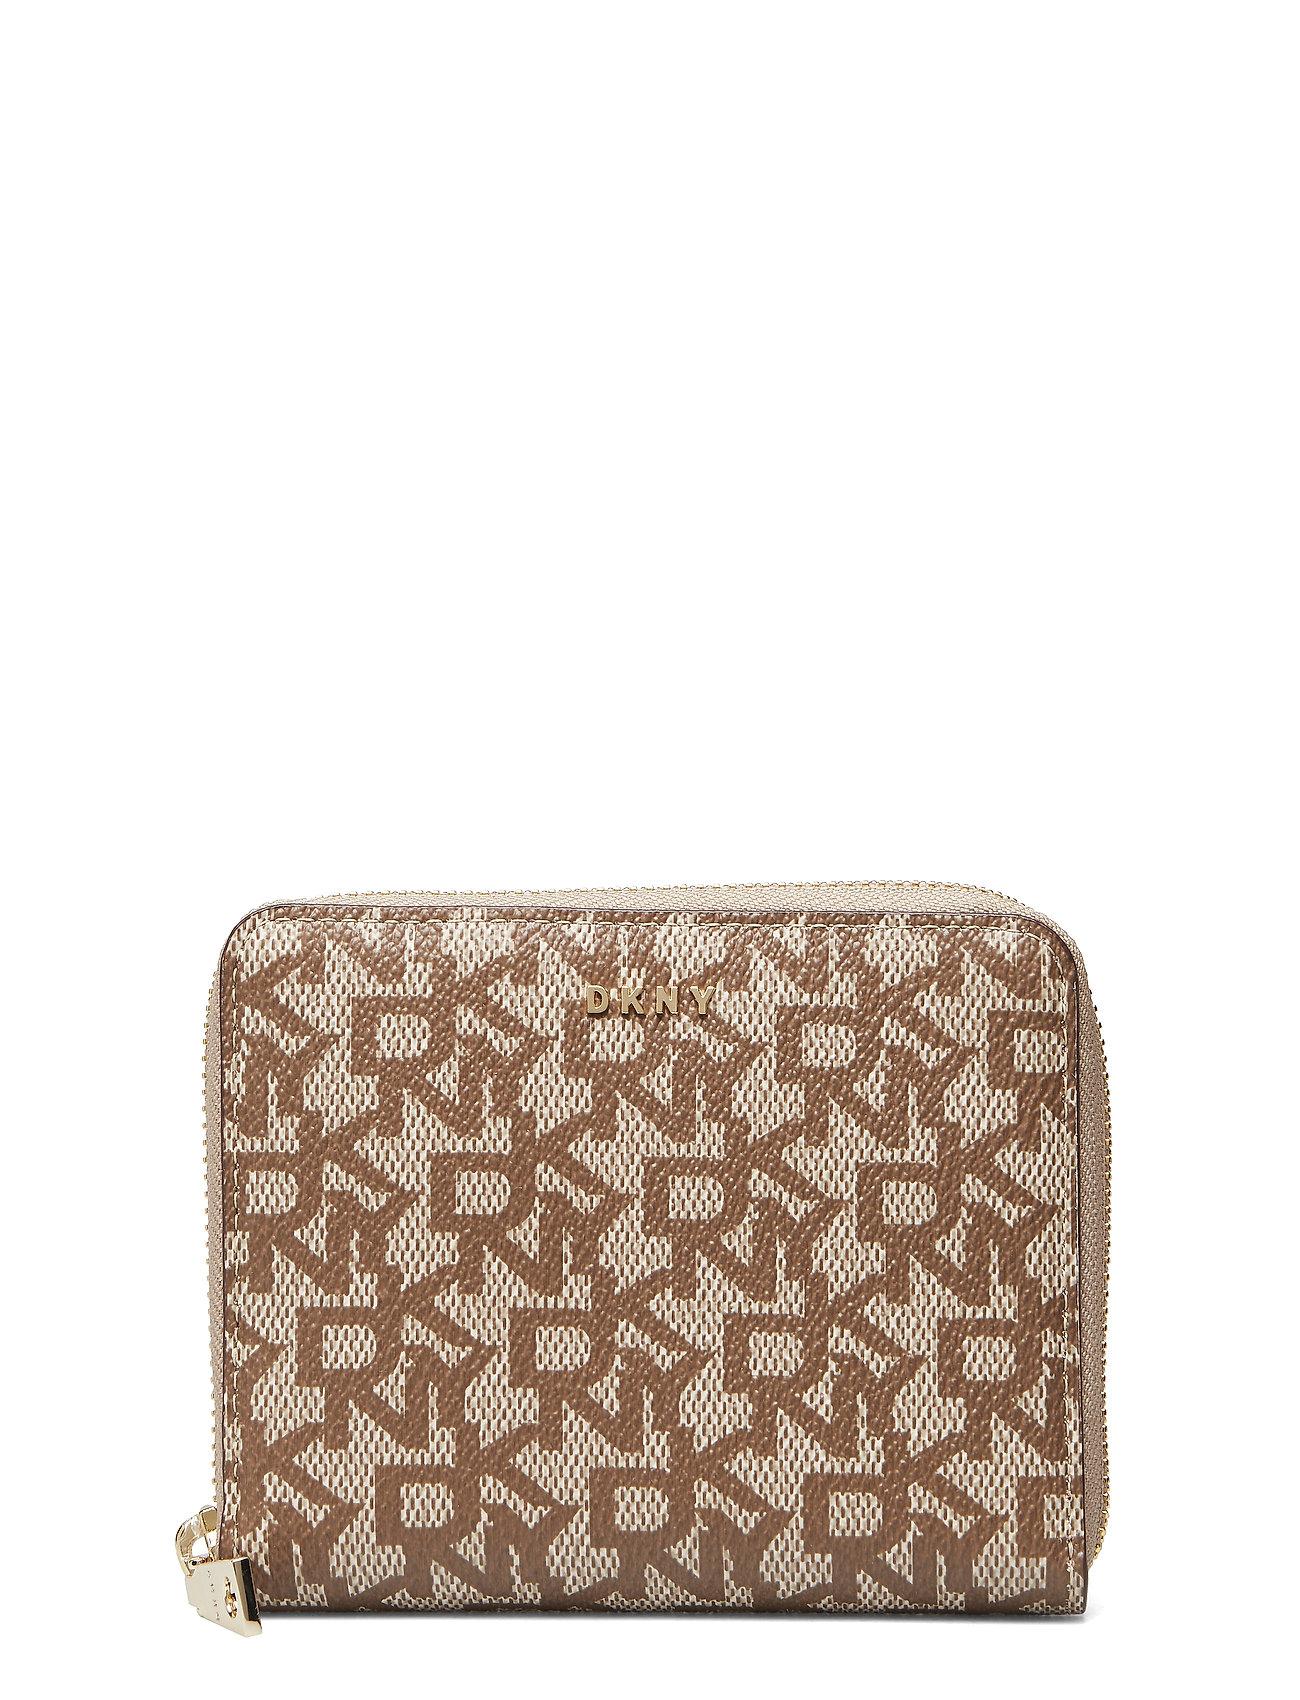 DKNY Bryant- Sm Zip Aroun Bags Card Holders & Wallets Wallets Beige DKNY BAGS